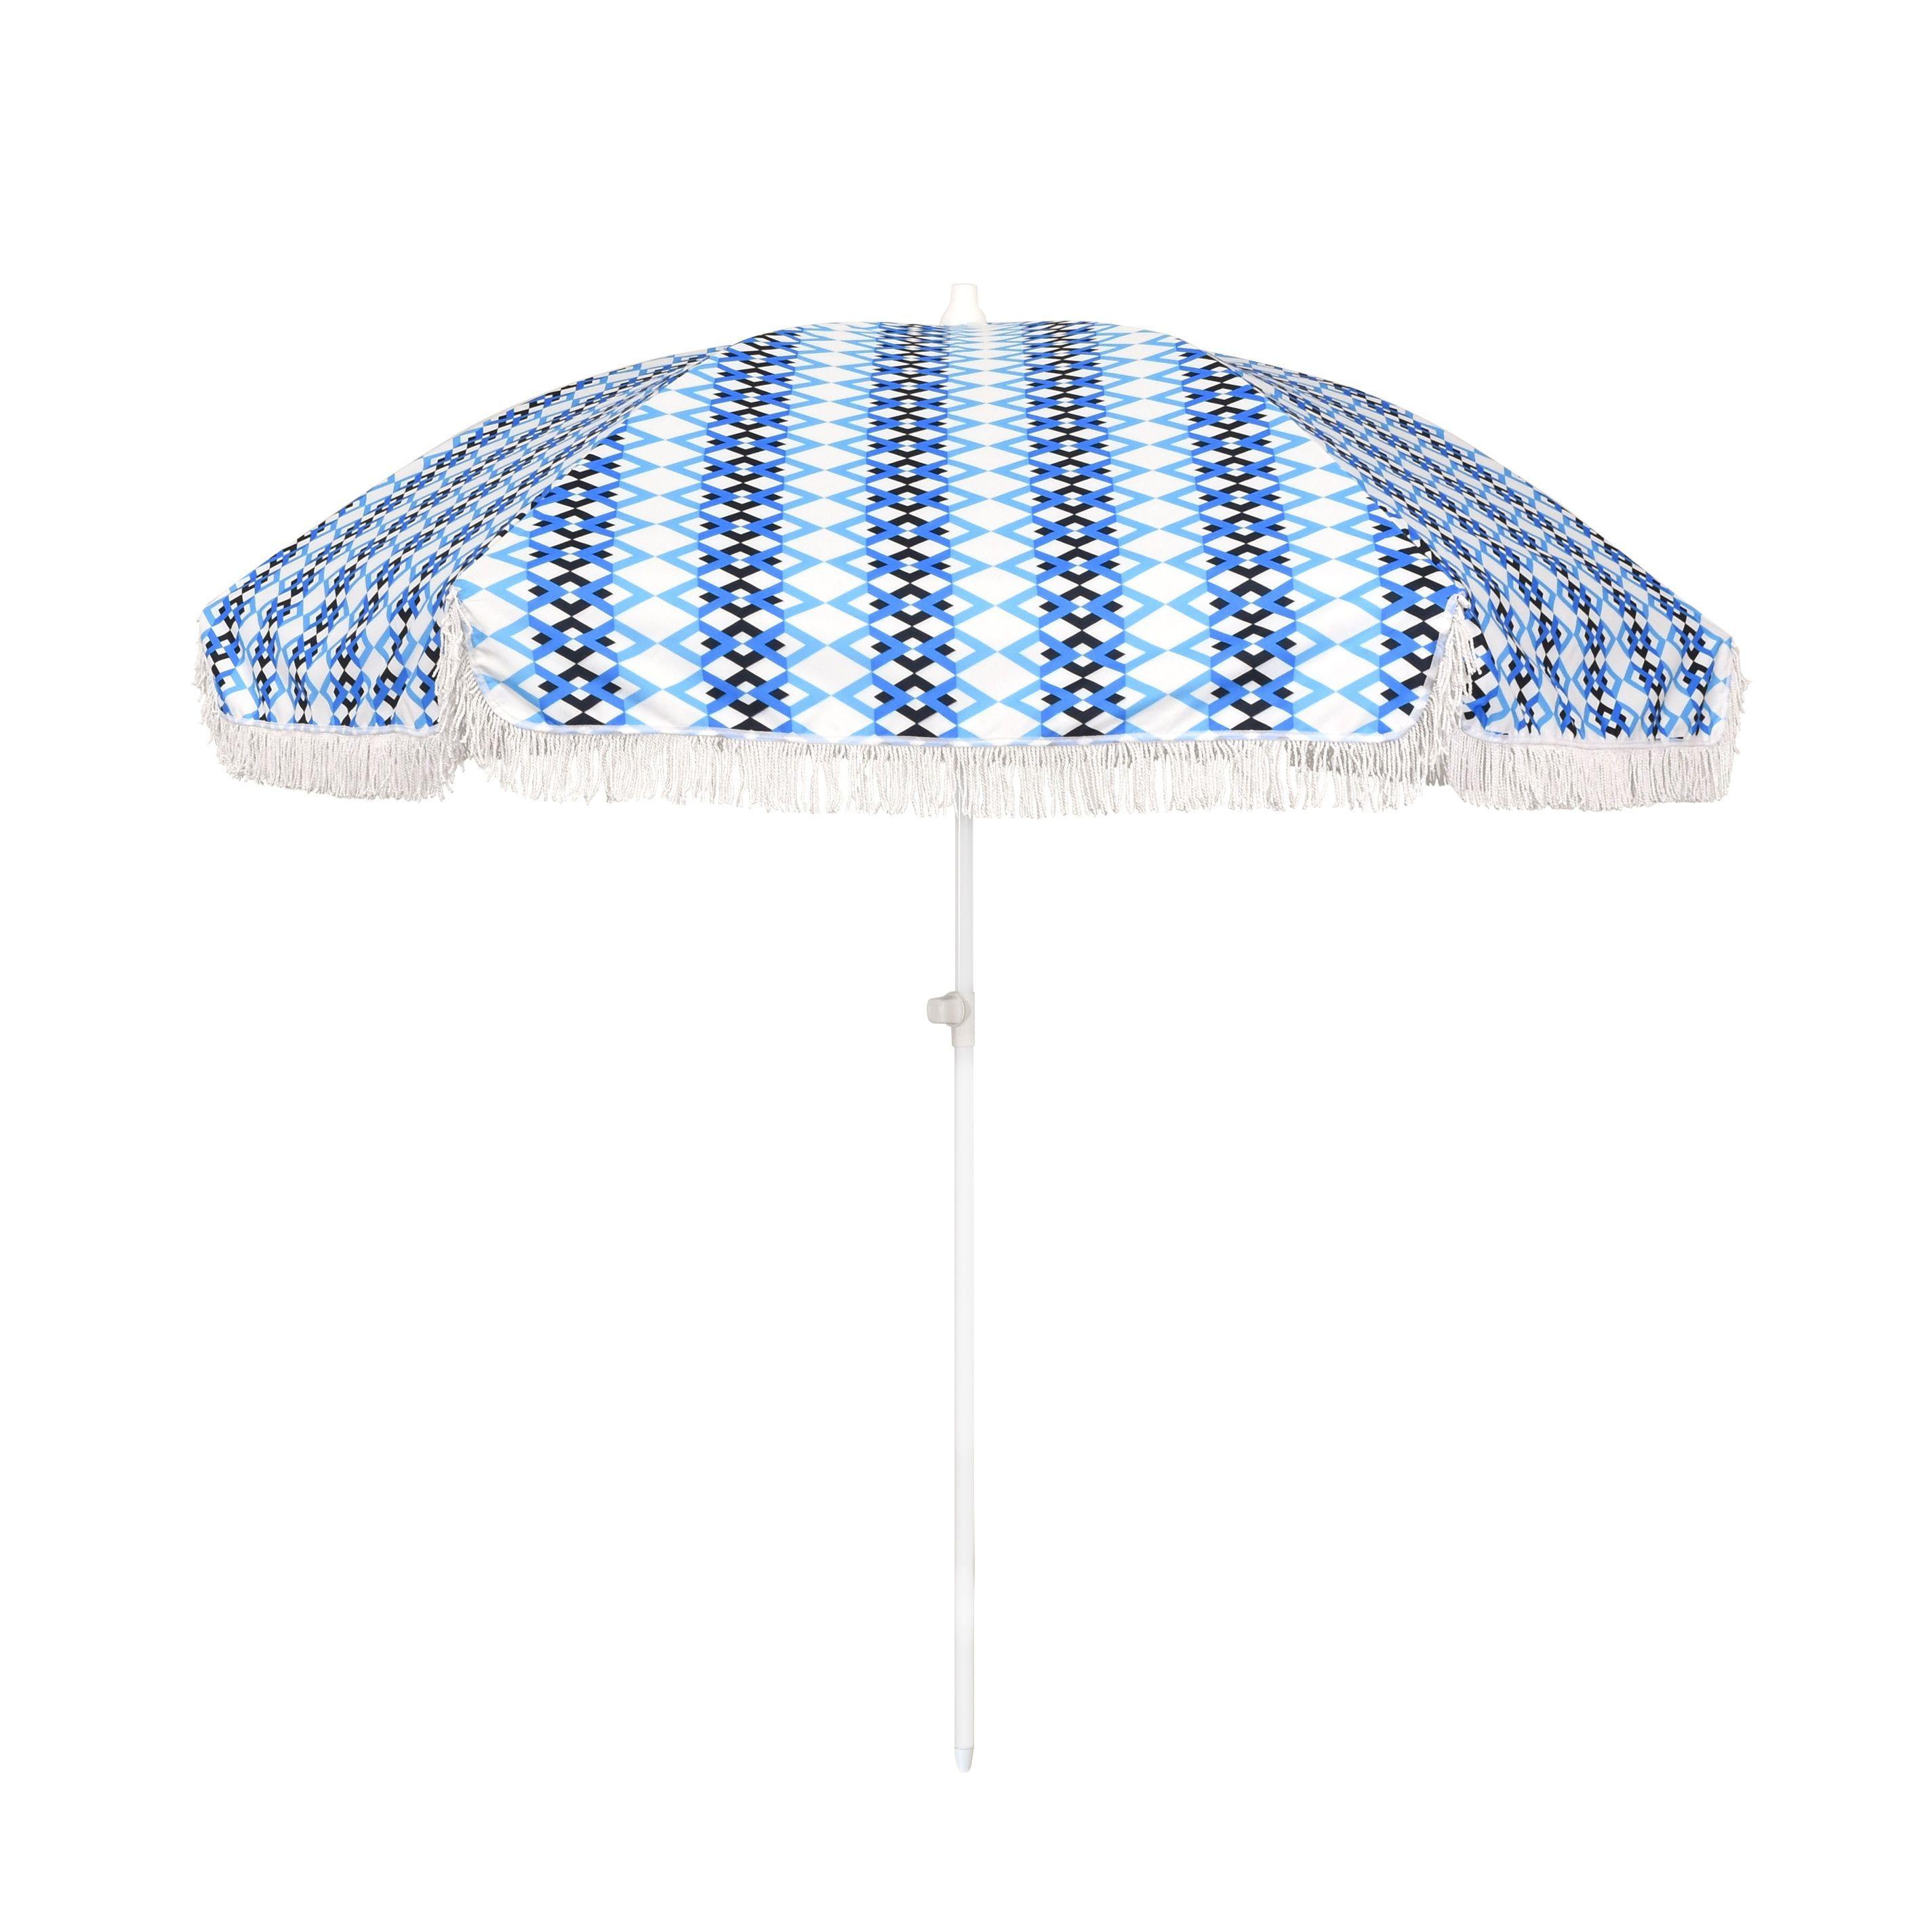 6 5 foot Round Push Open Fiberglass Rib Fringed Beach Umbrella Set